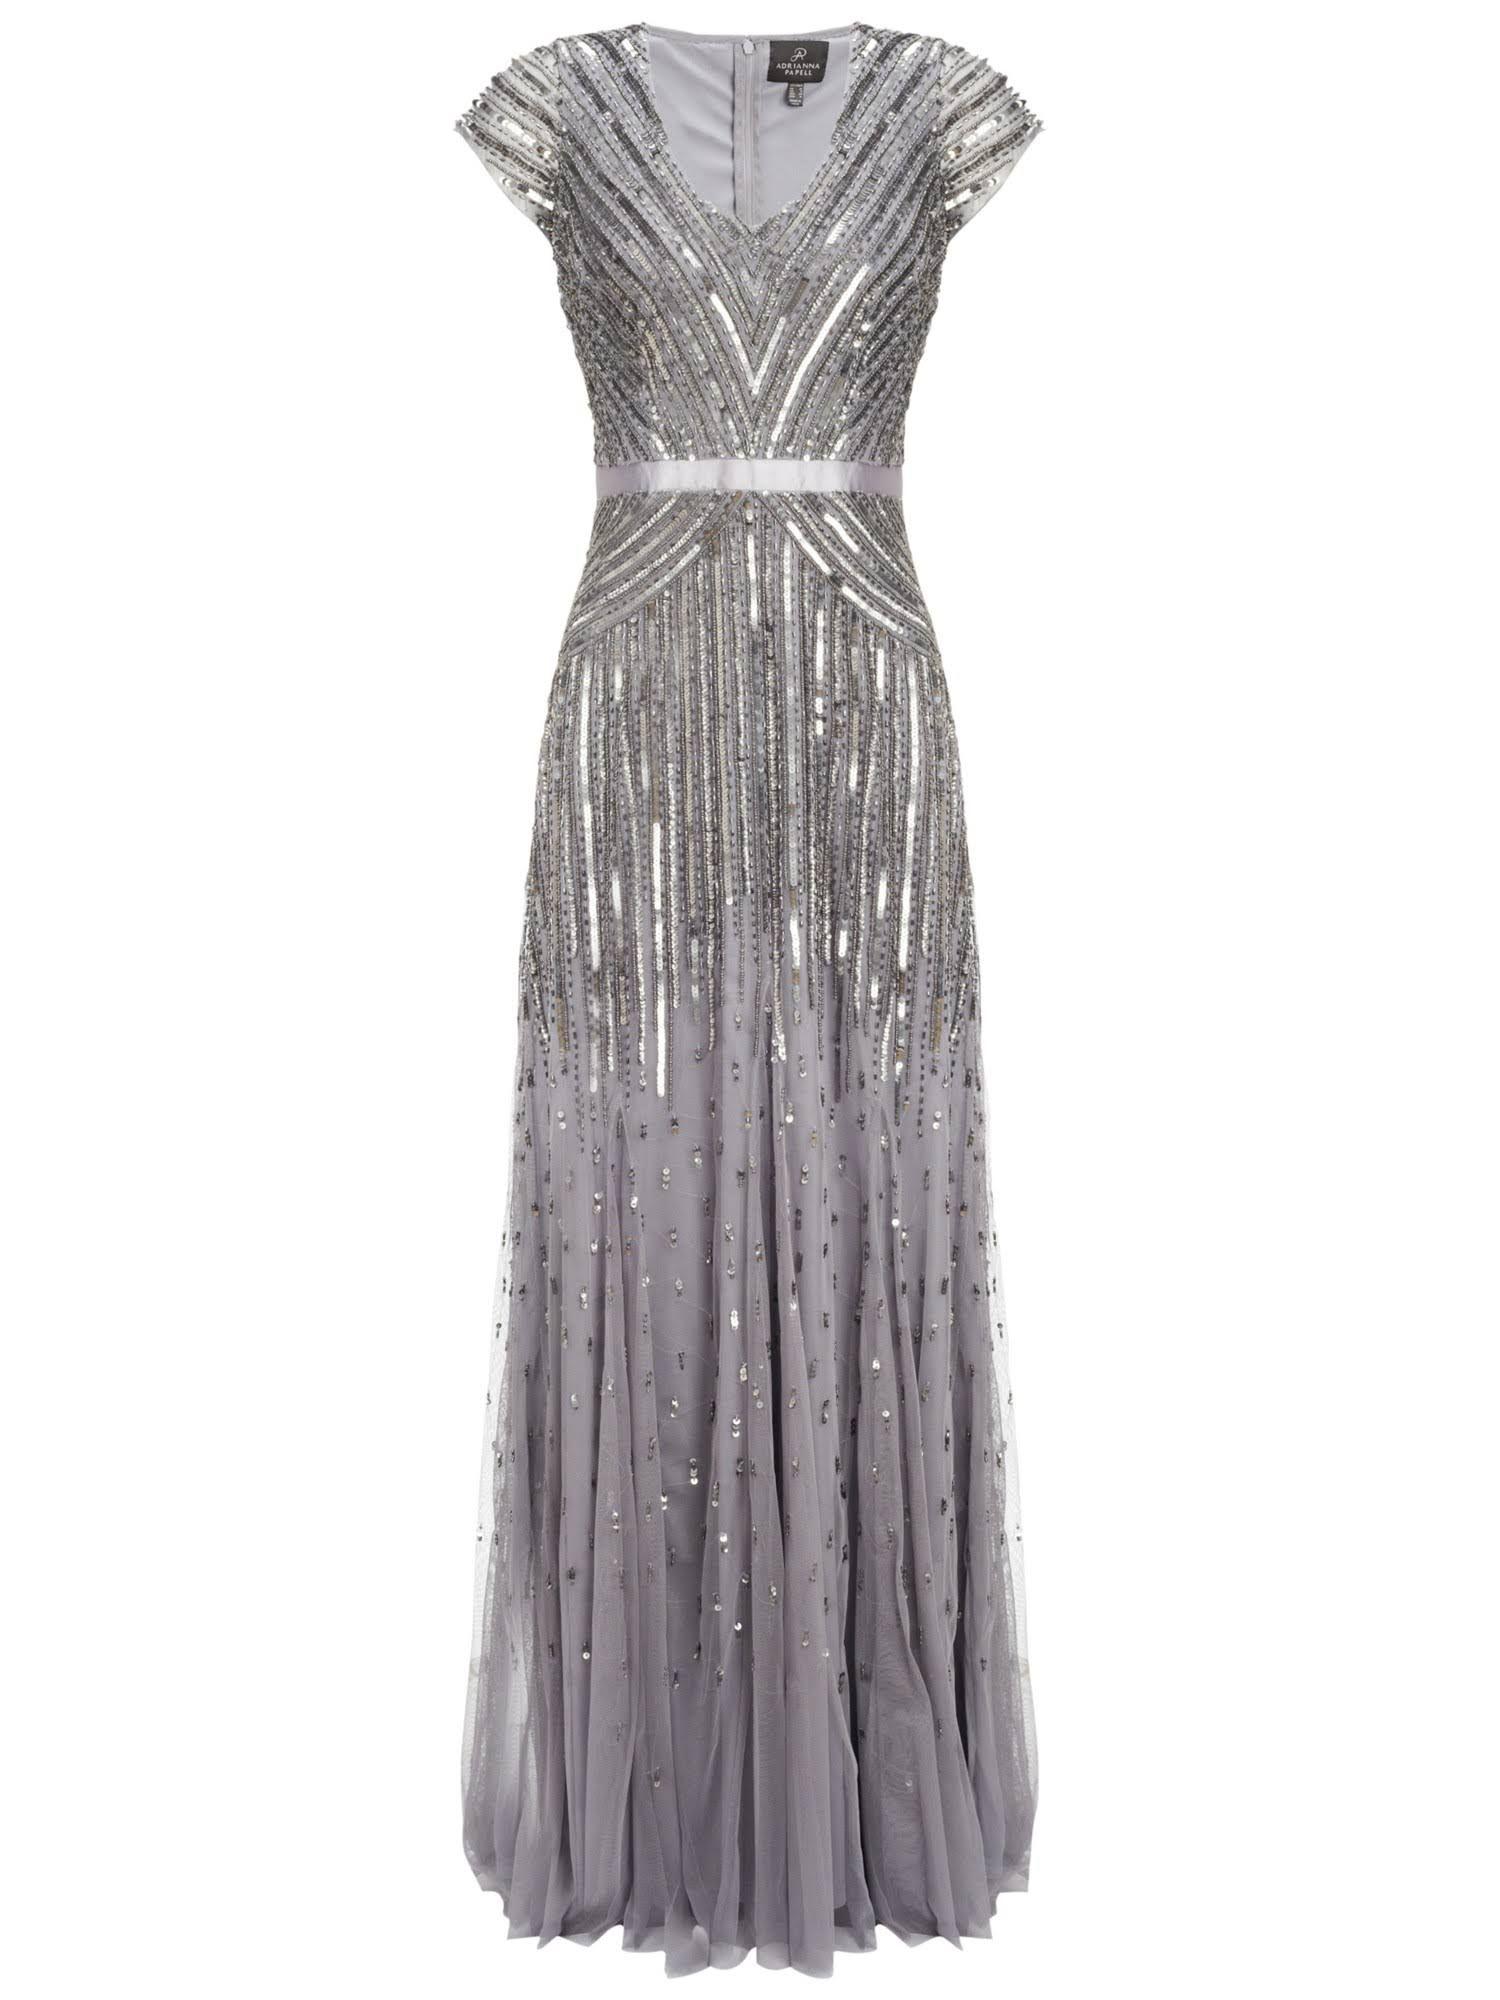 d64ccf2436 Adrianna Papell Cap Sleeve Long Sequin Dress, Silver/Grey ...